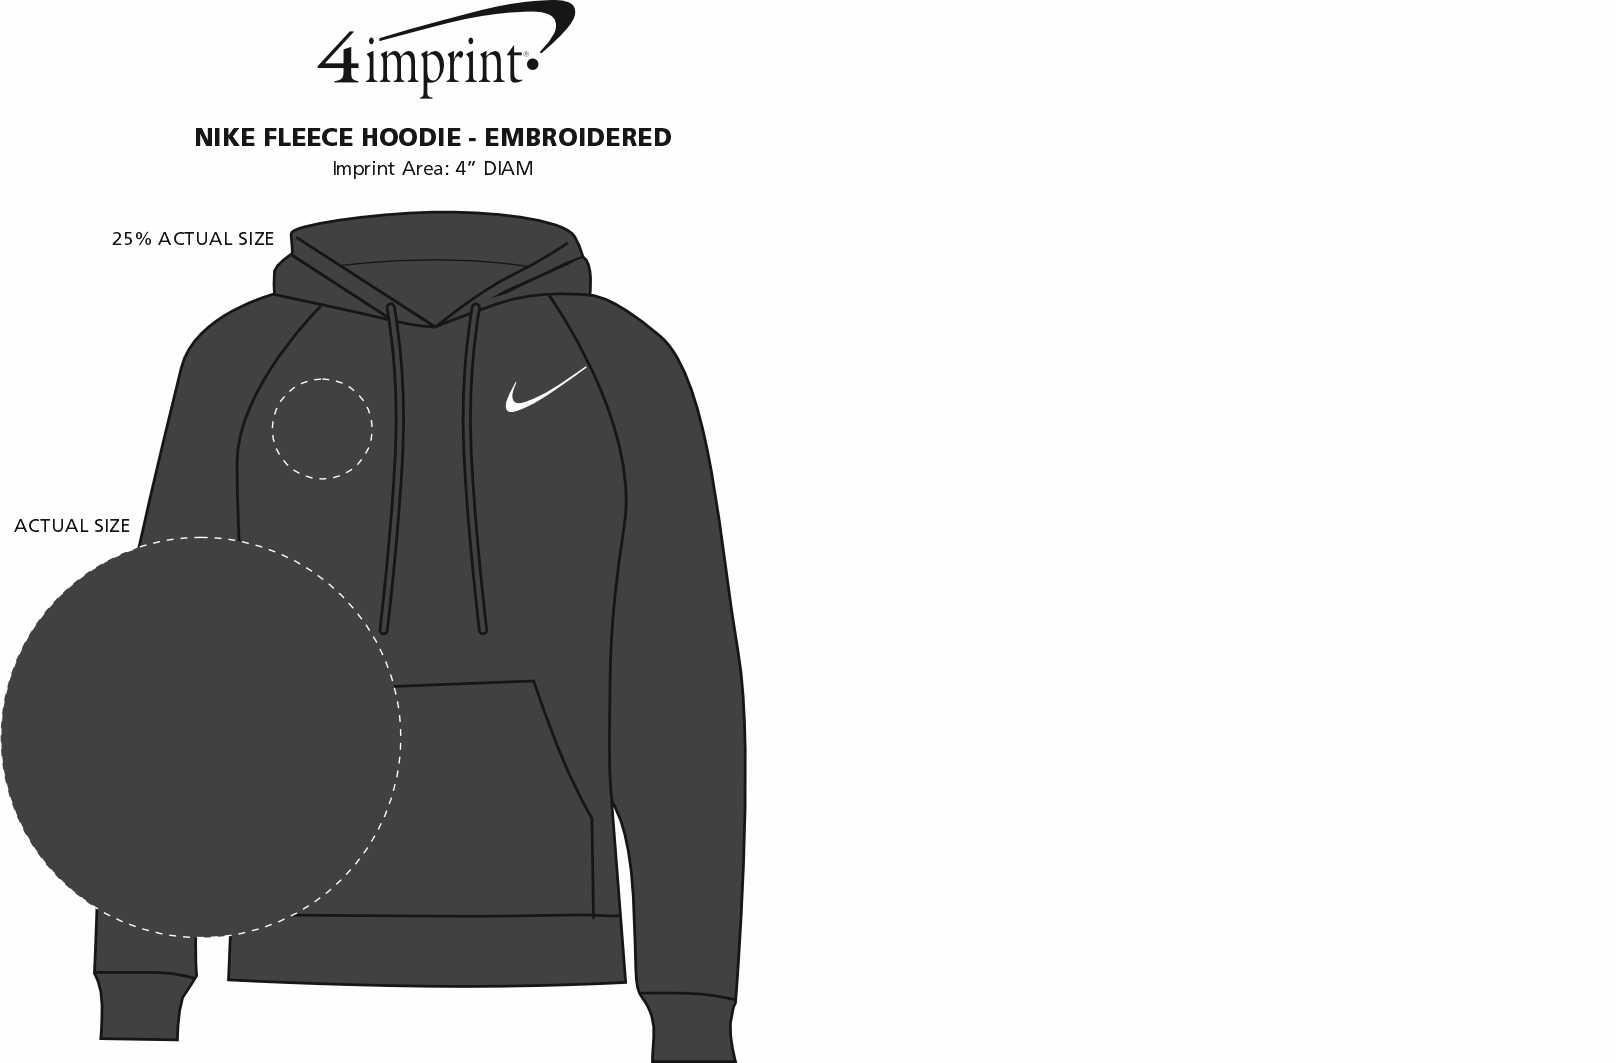 Imprint Area of Nike Fleece Hoodie - Embroidered